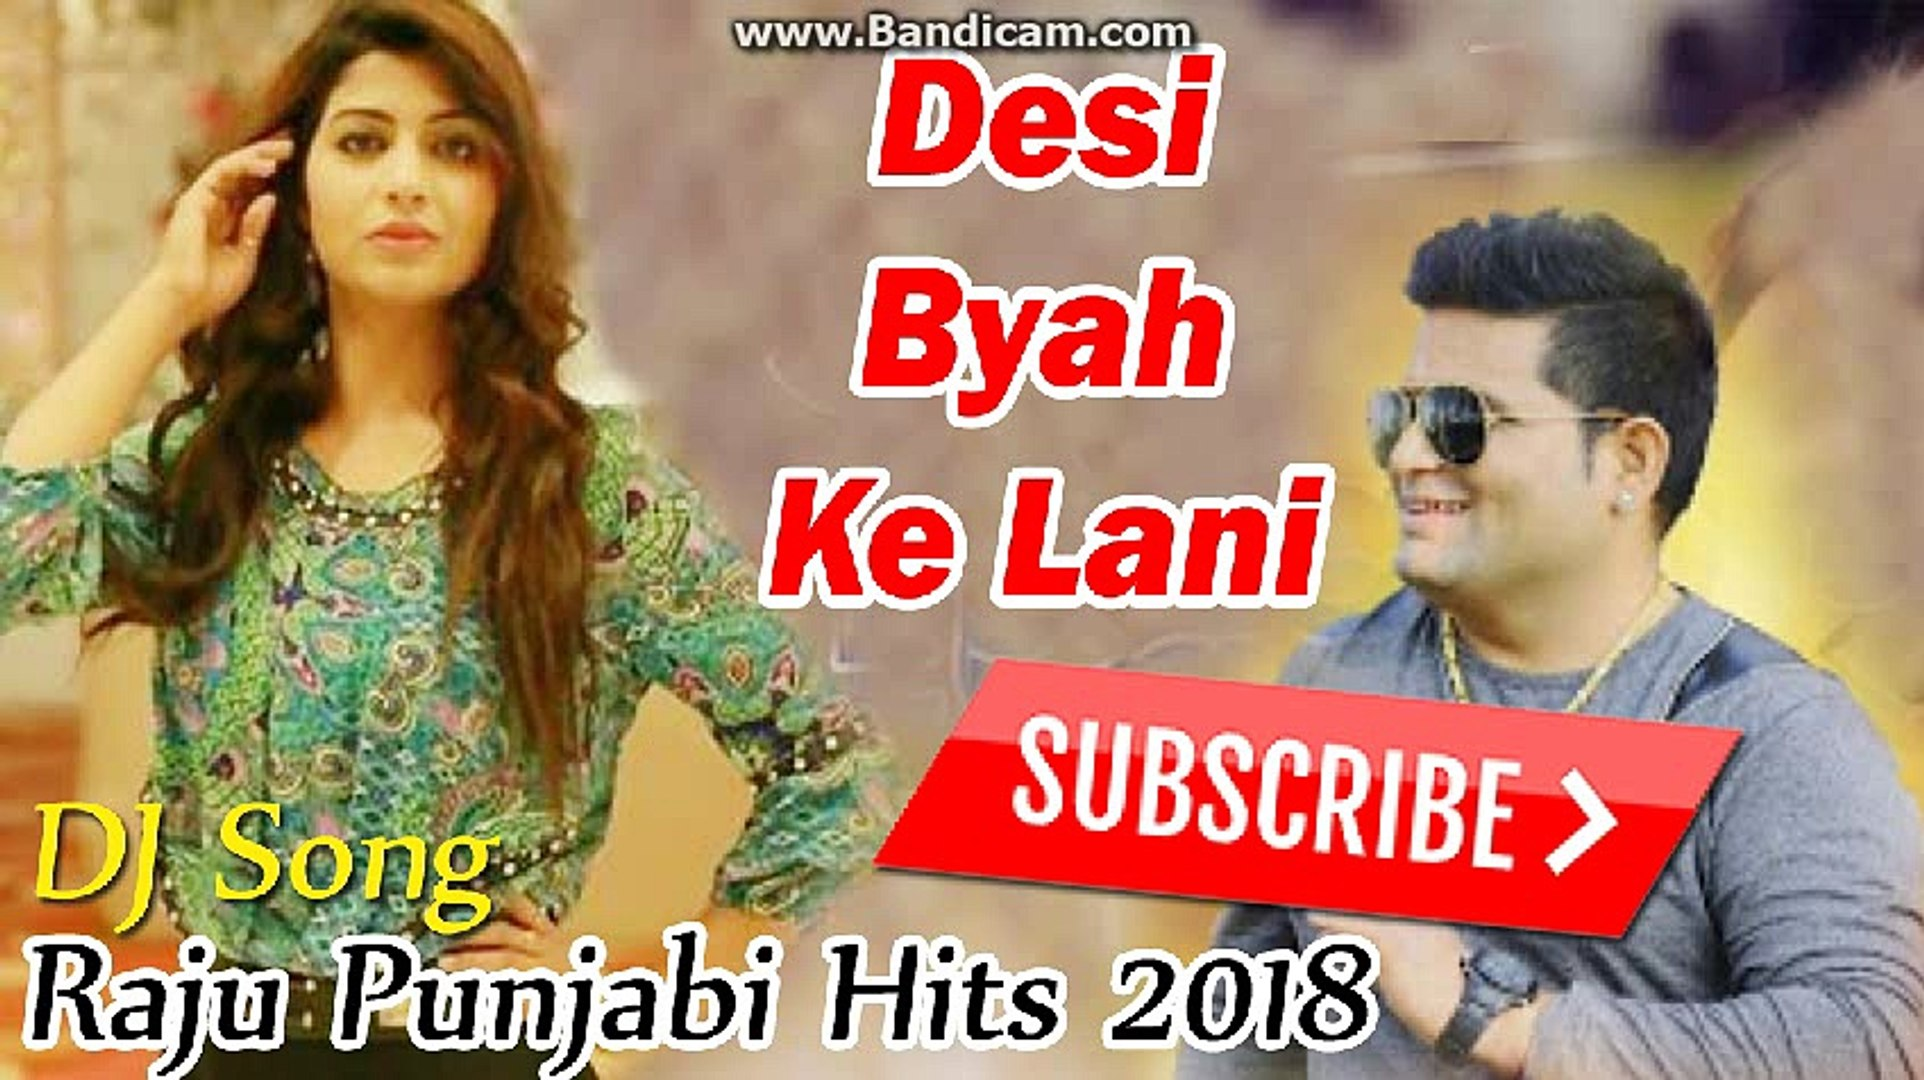 New hr song 2017 download raju punjabi | Raju Punjabi New